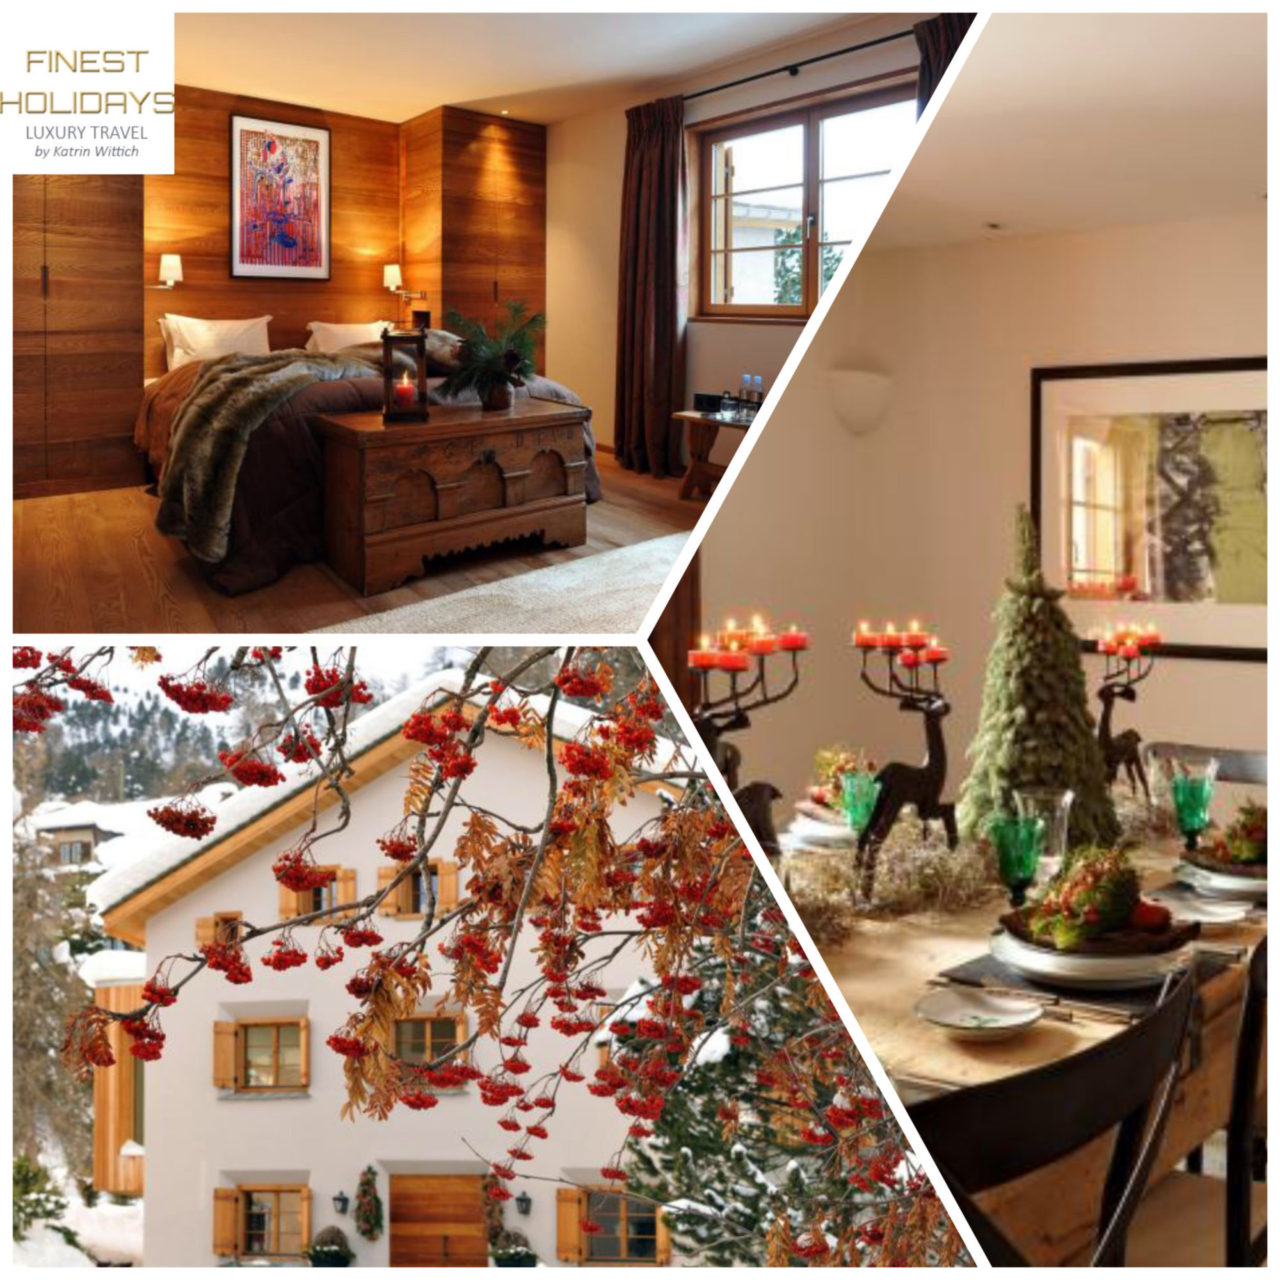 www.finest-holidays.com Swiss Alps, St. Moritz, luxury chalet Chesetta, Switzerland